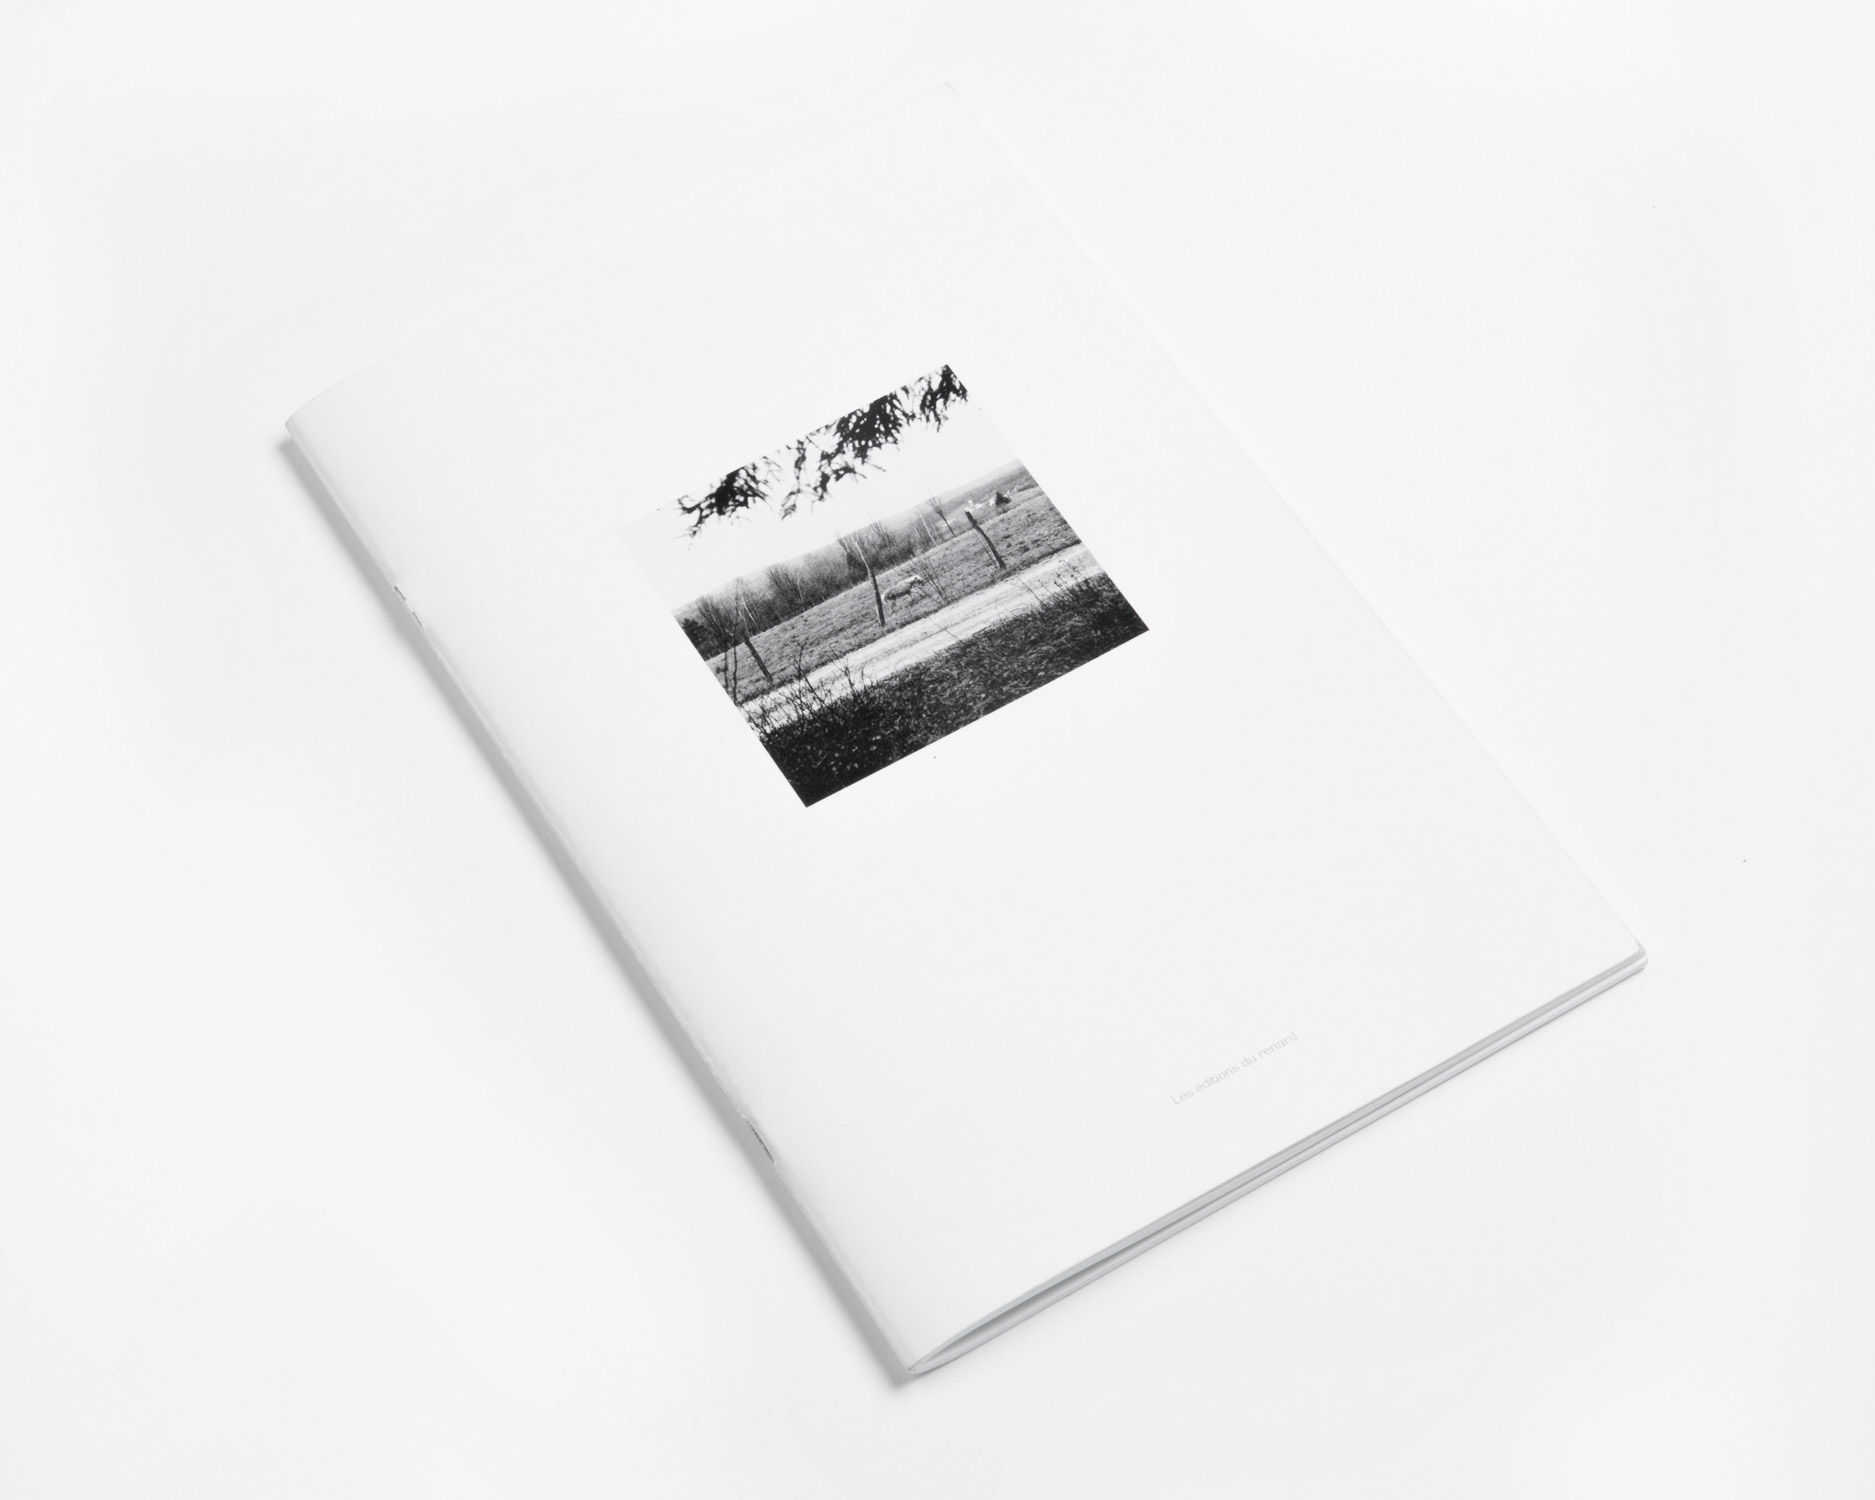 Ruissellement – Louis Perreault